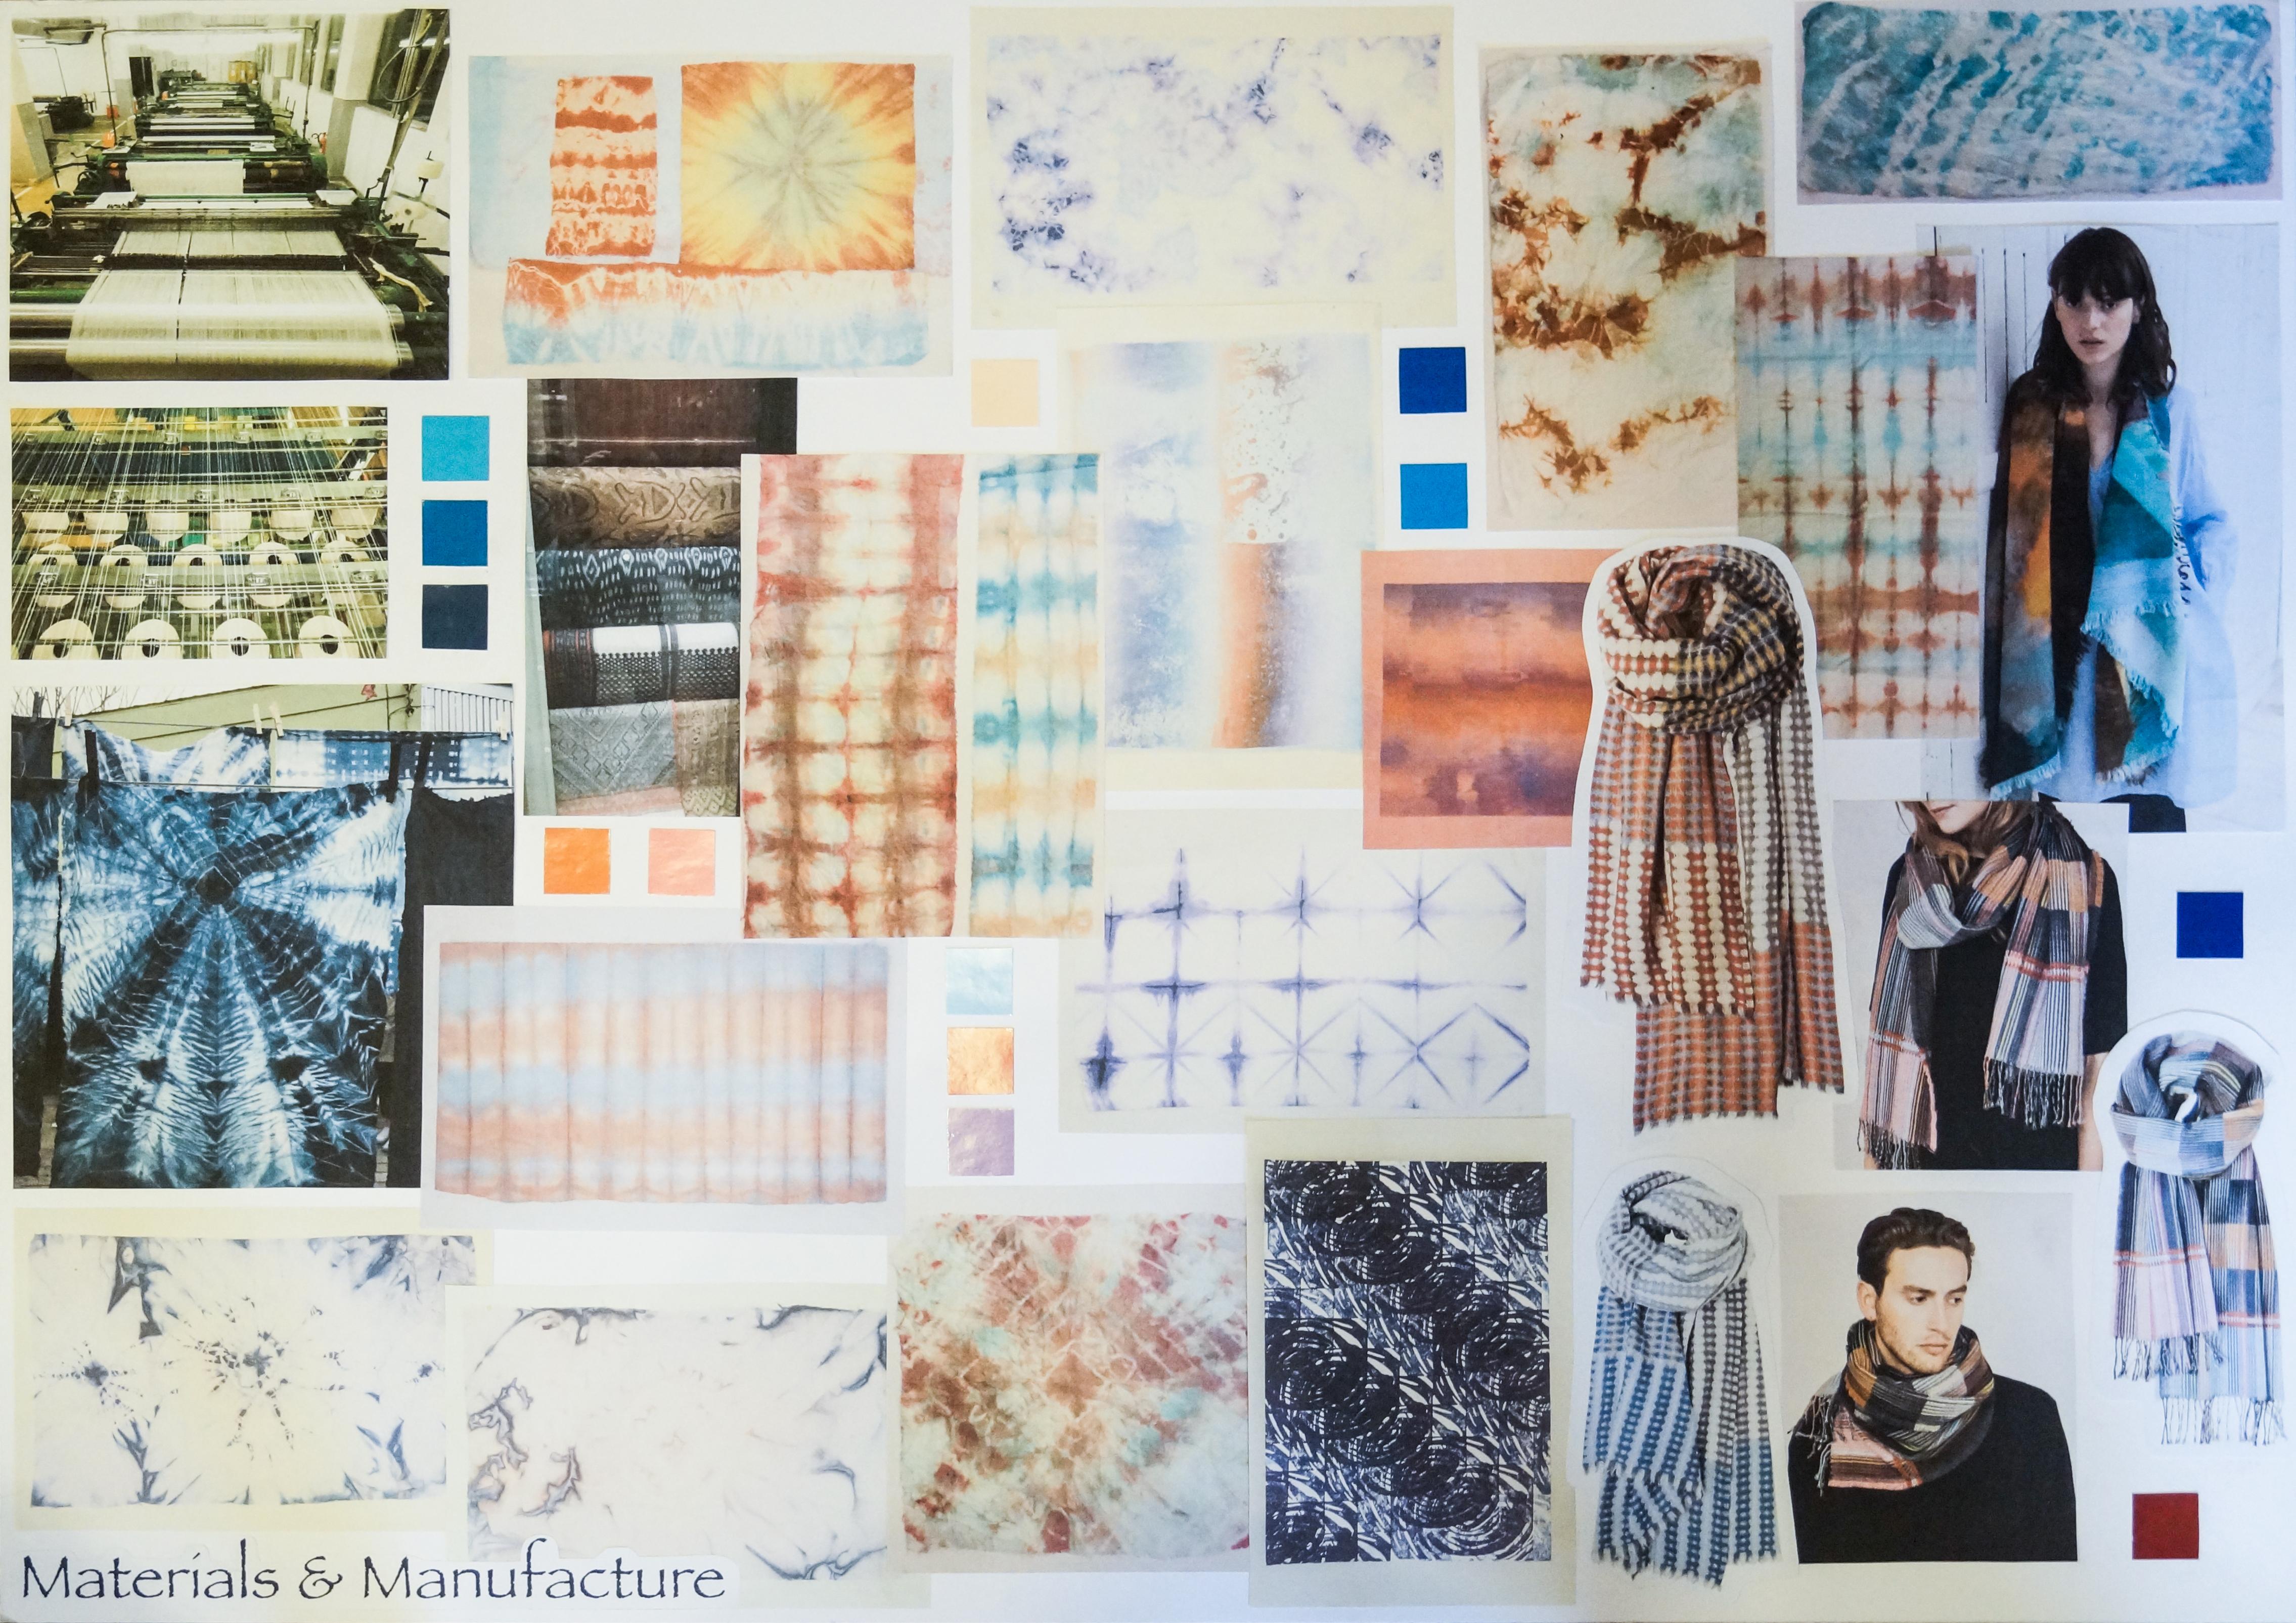 Materials & Manufacture